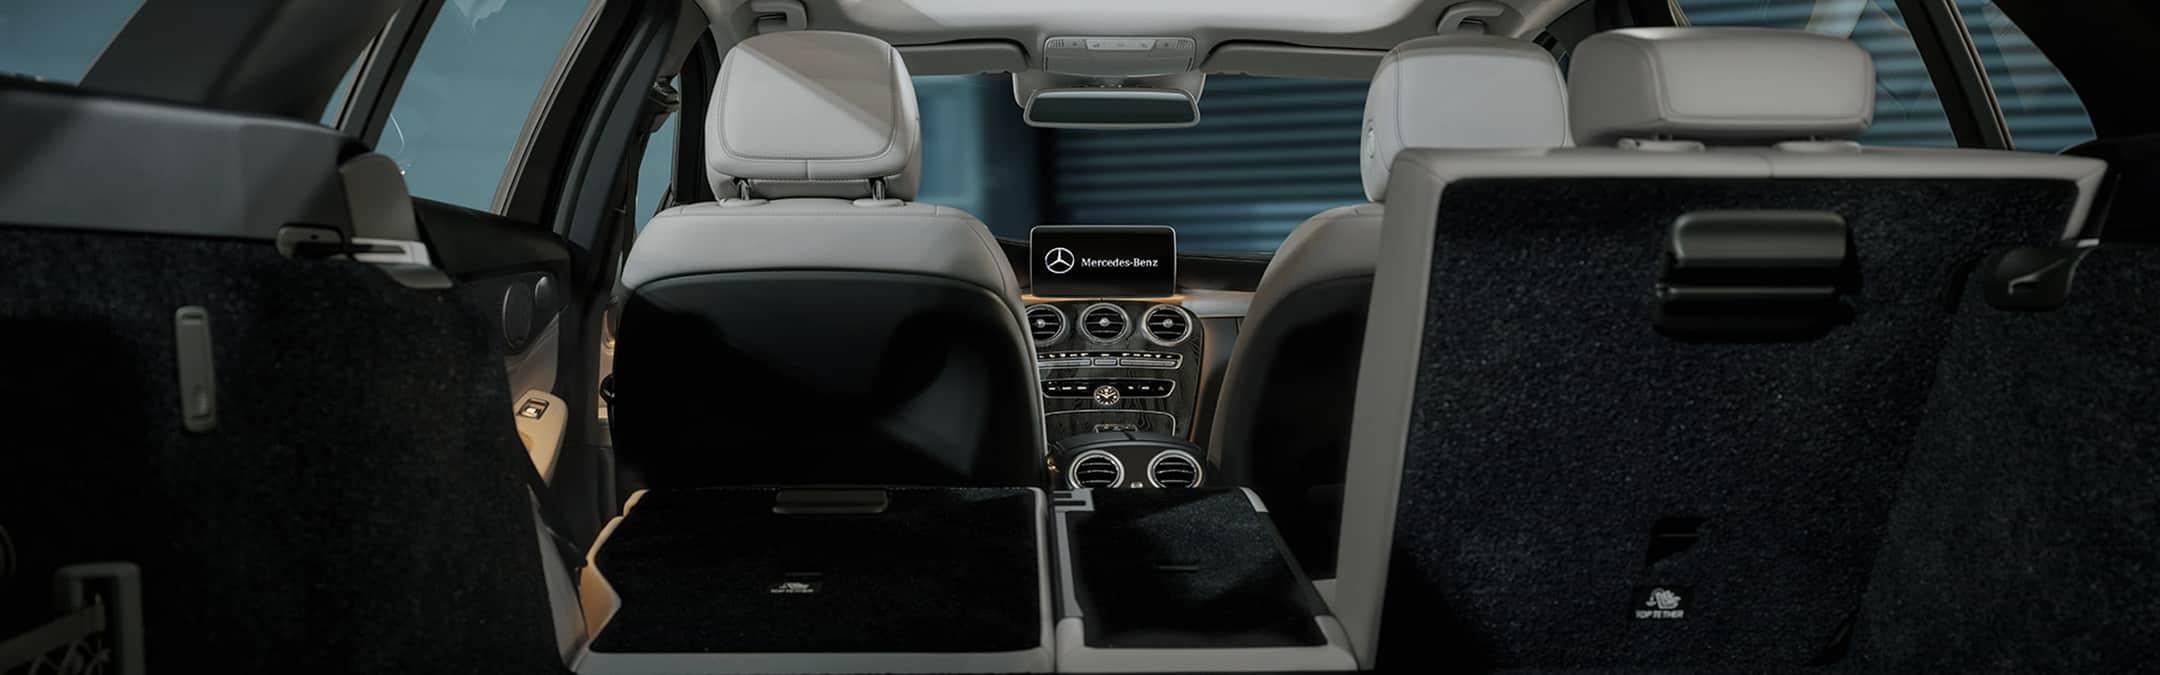 The 2019 C-Class Wagon